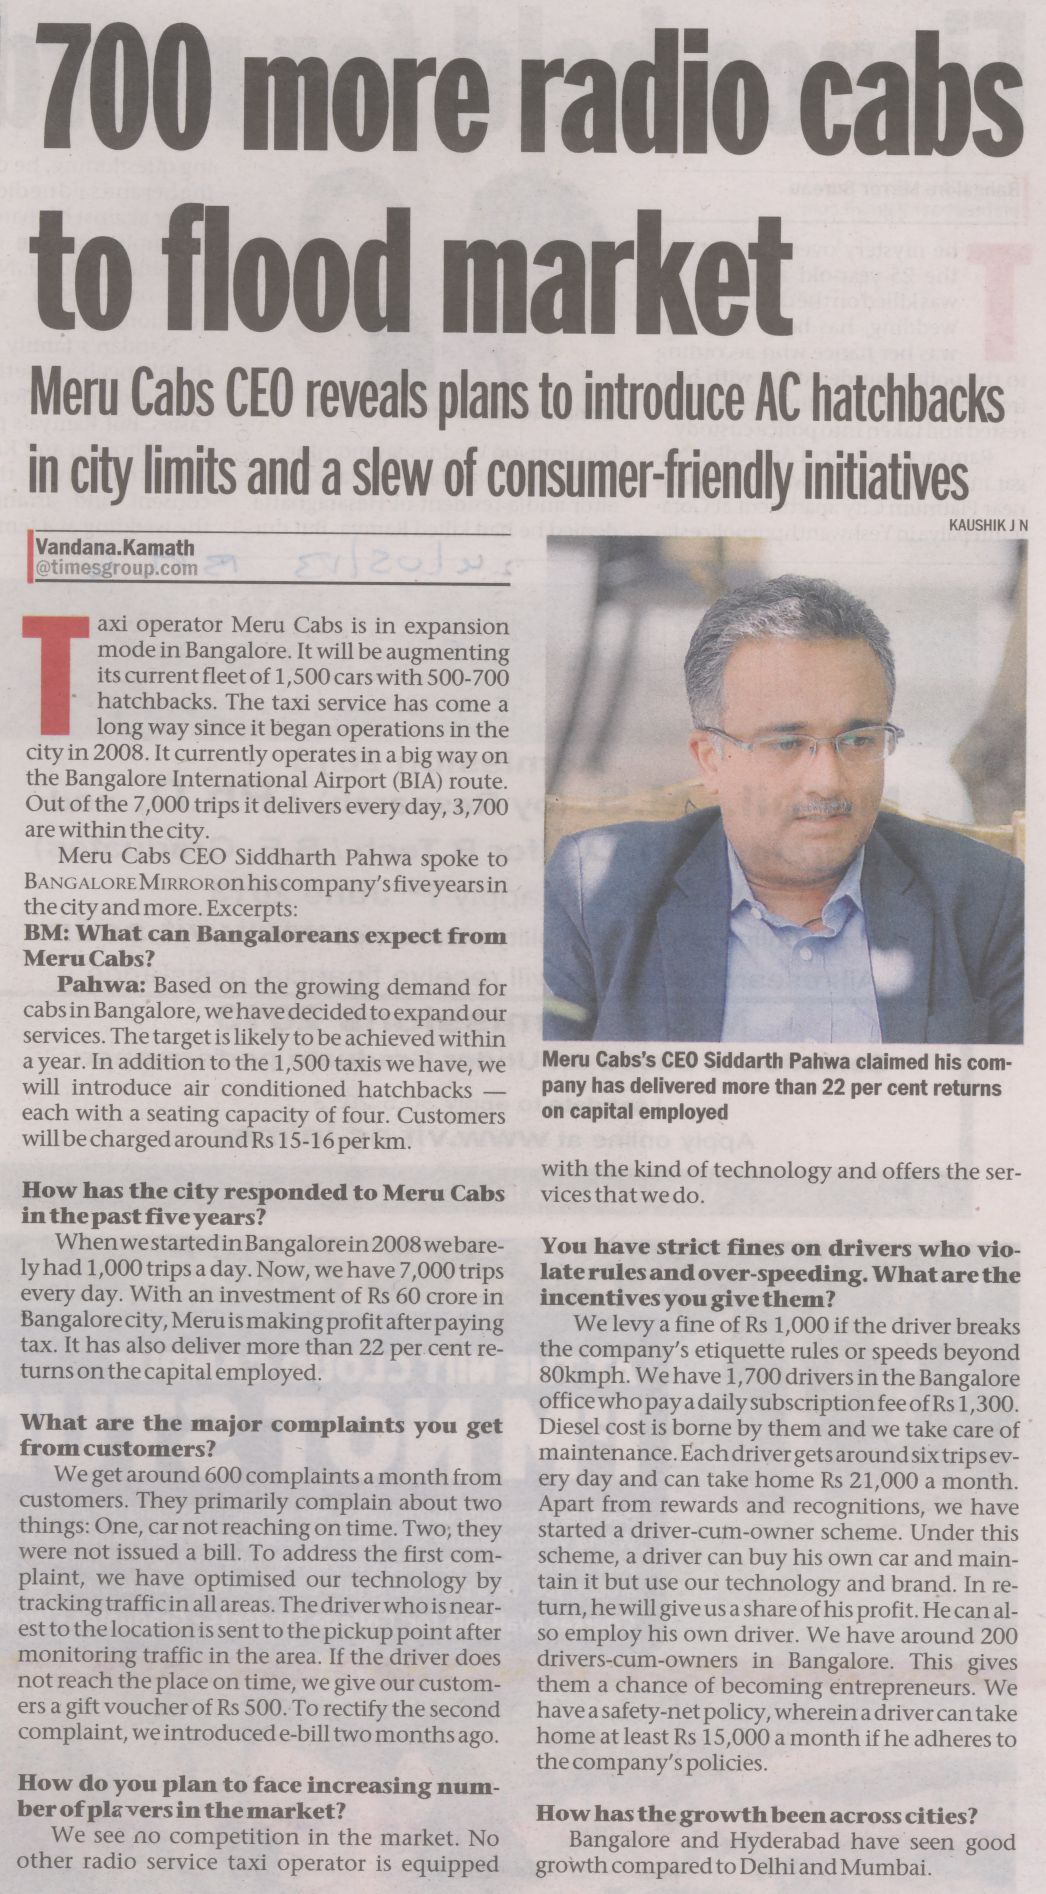 Bangalore Mirror- 700 more radio cabs to flood market